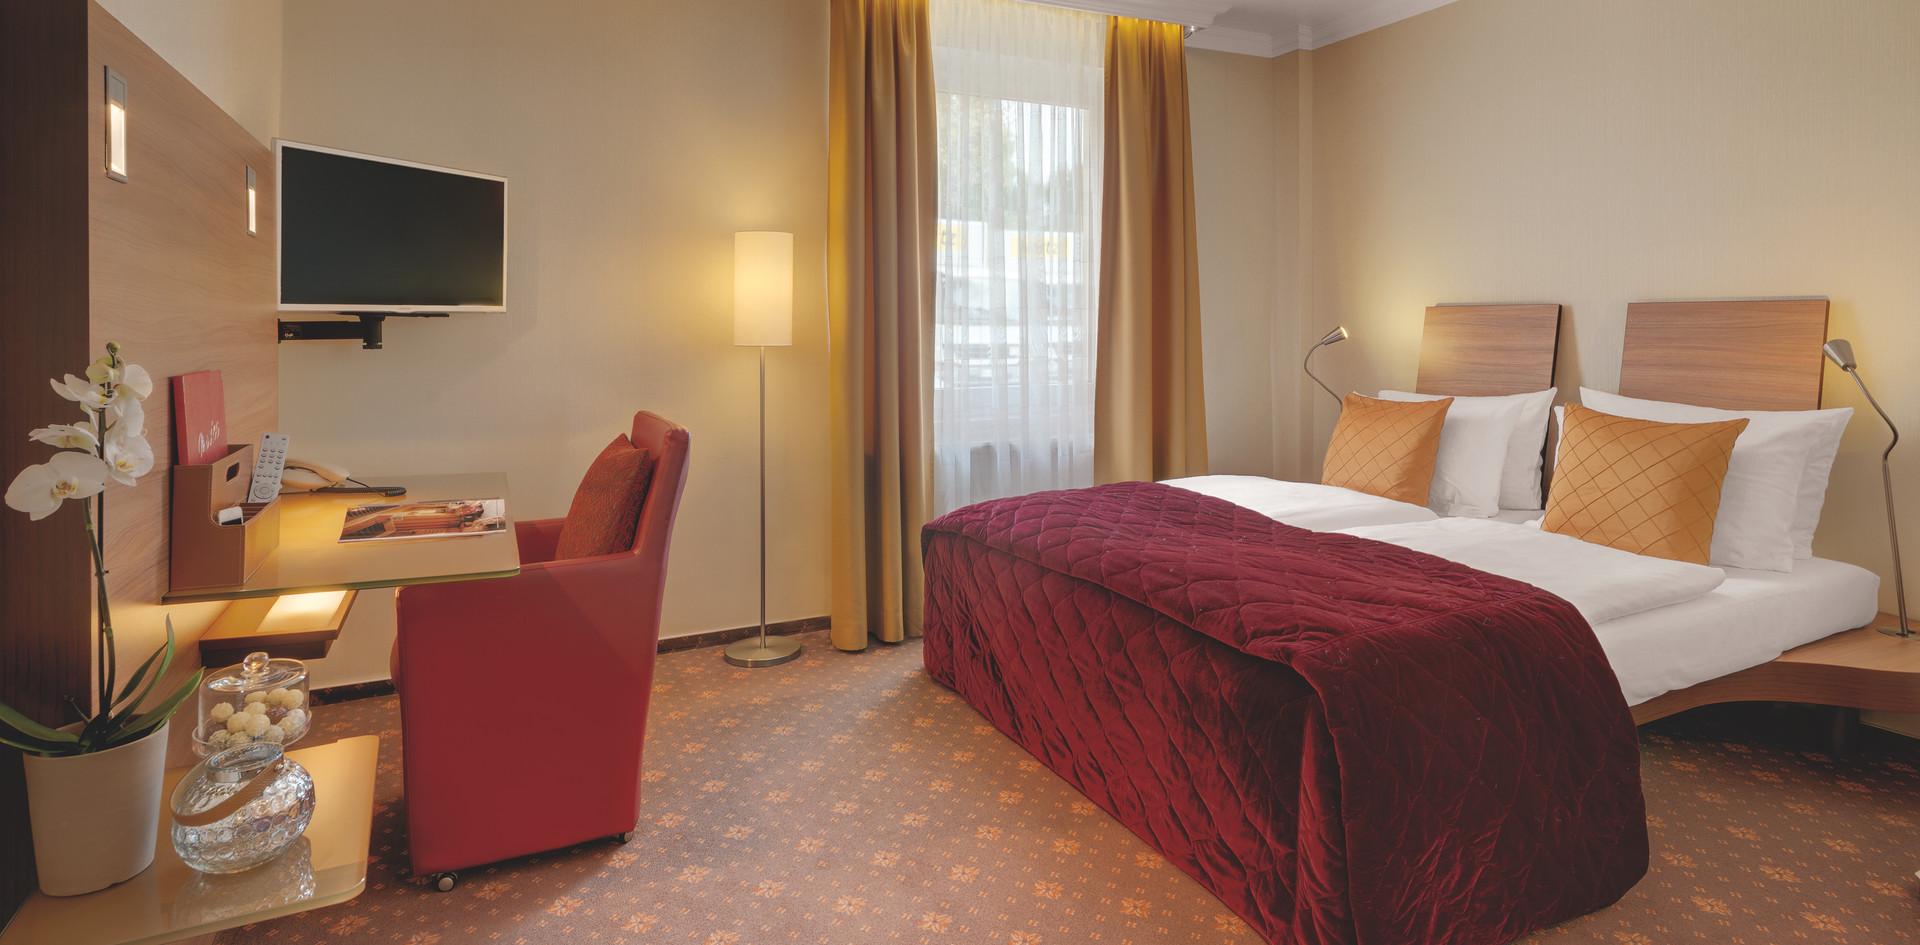 Doppelzimmer Hotel Wegner - The culinary Art Hotel